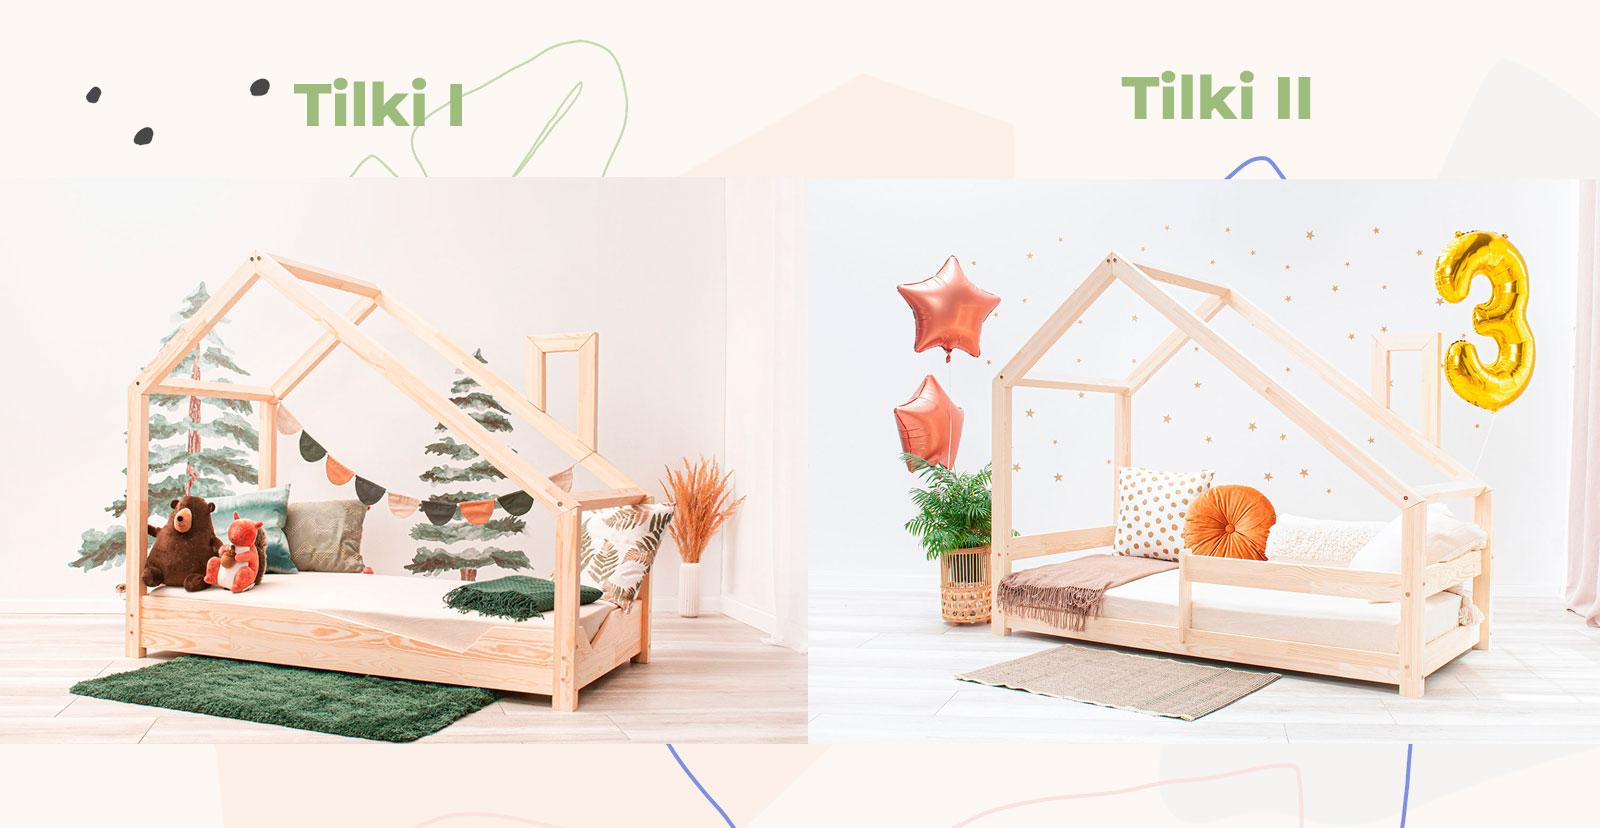 Tilki I und Tilki II Kinderbetten Vergleich